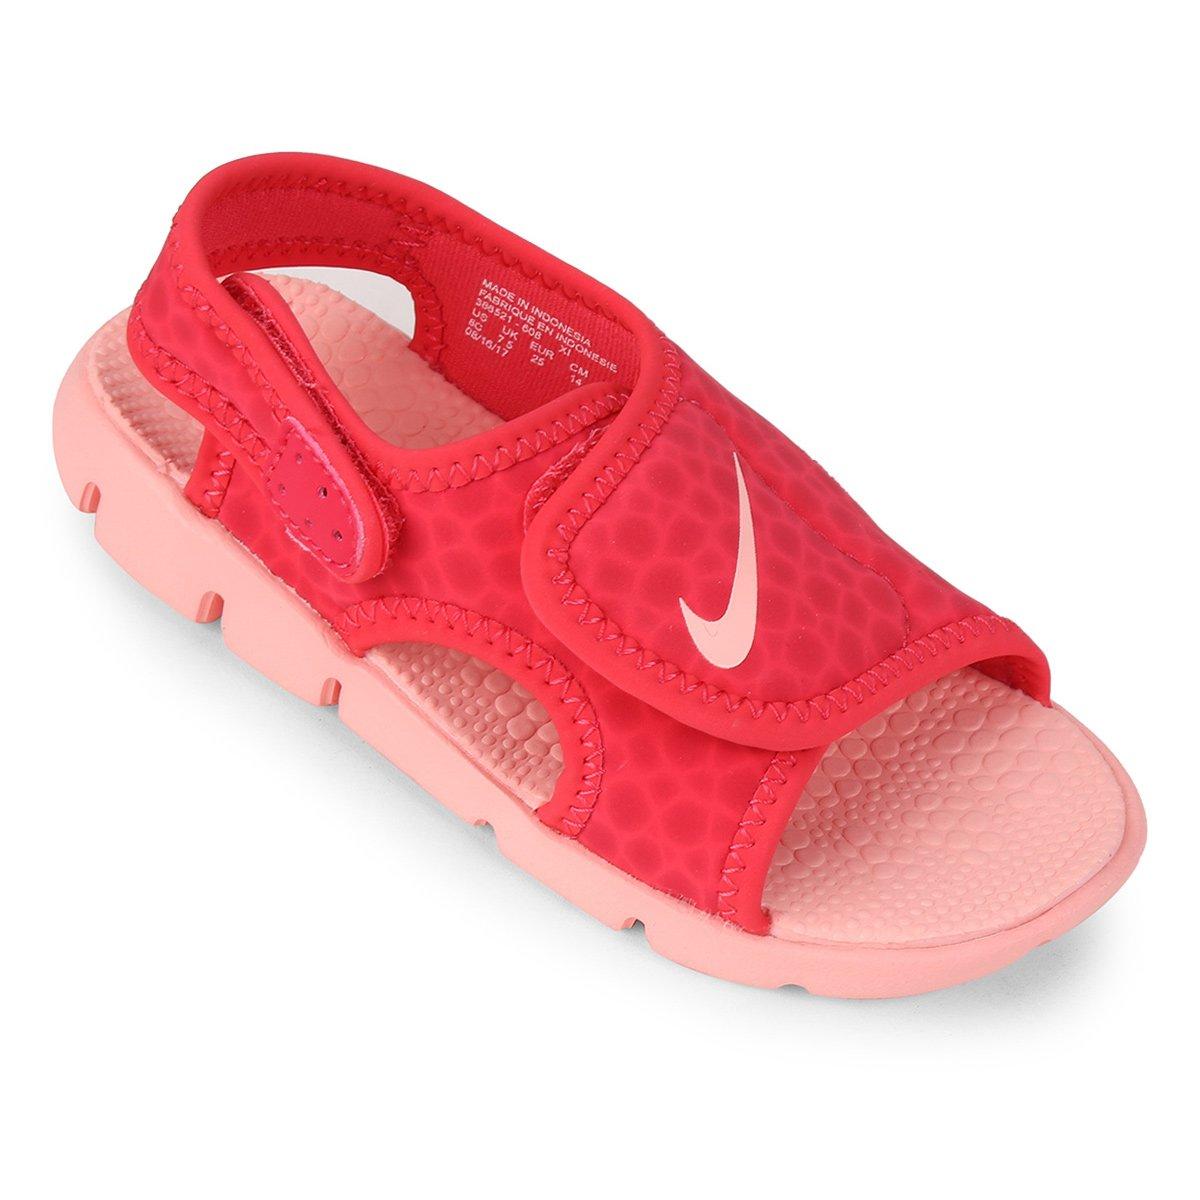 2a6d8ce7bd Sandália Nike Sunray Adjust 4 Infantil - Coral - Compre Agora